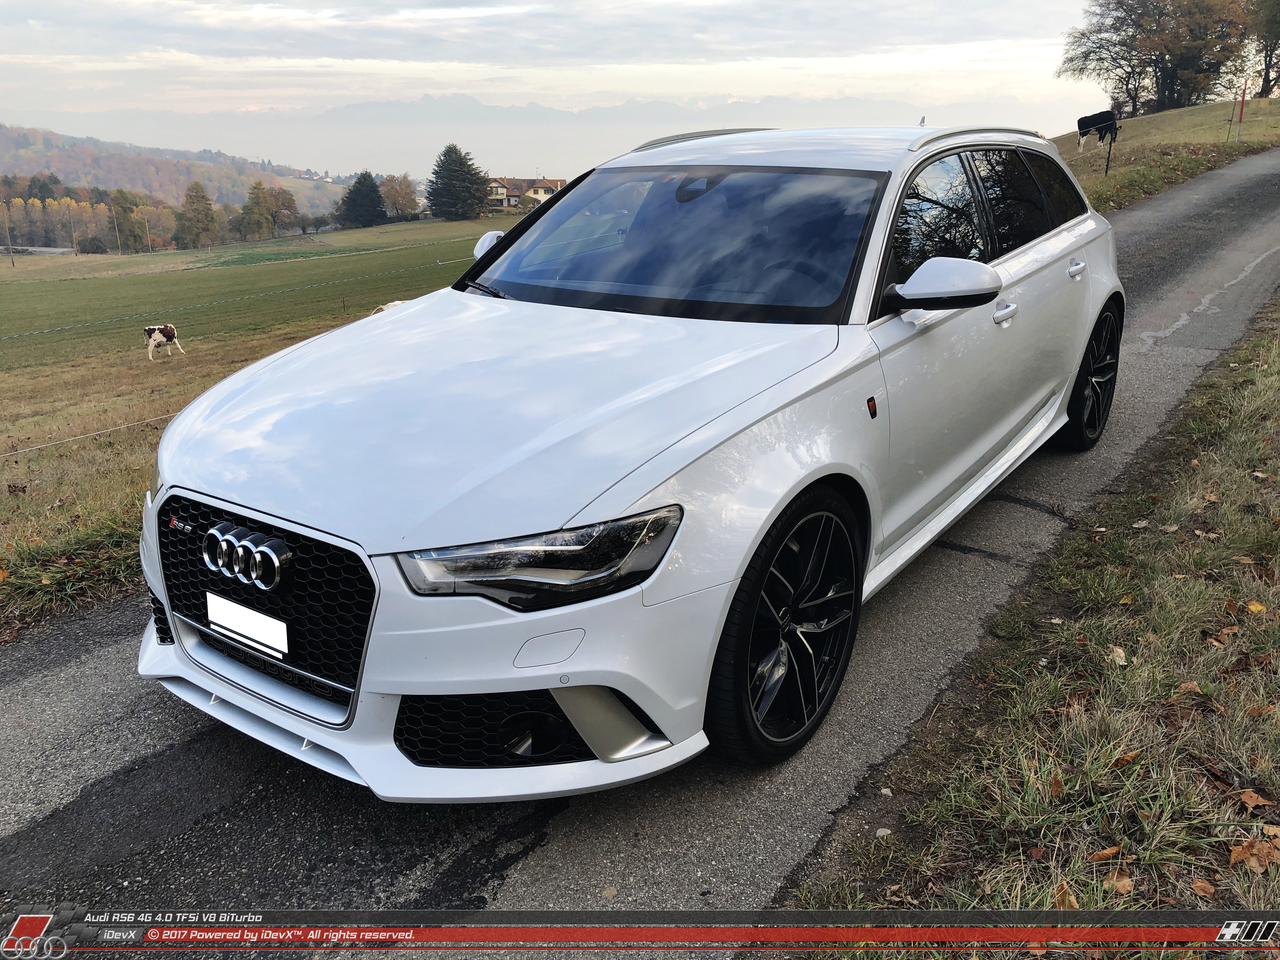 09_11.2018_Audi-RS6_iDevX_003.png